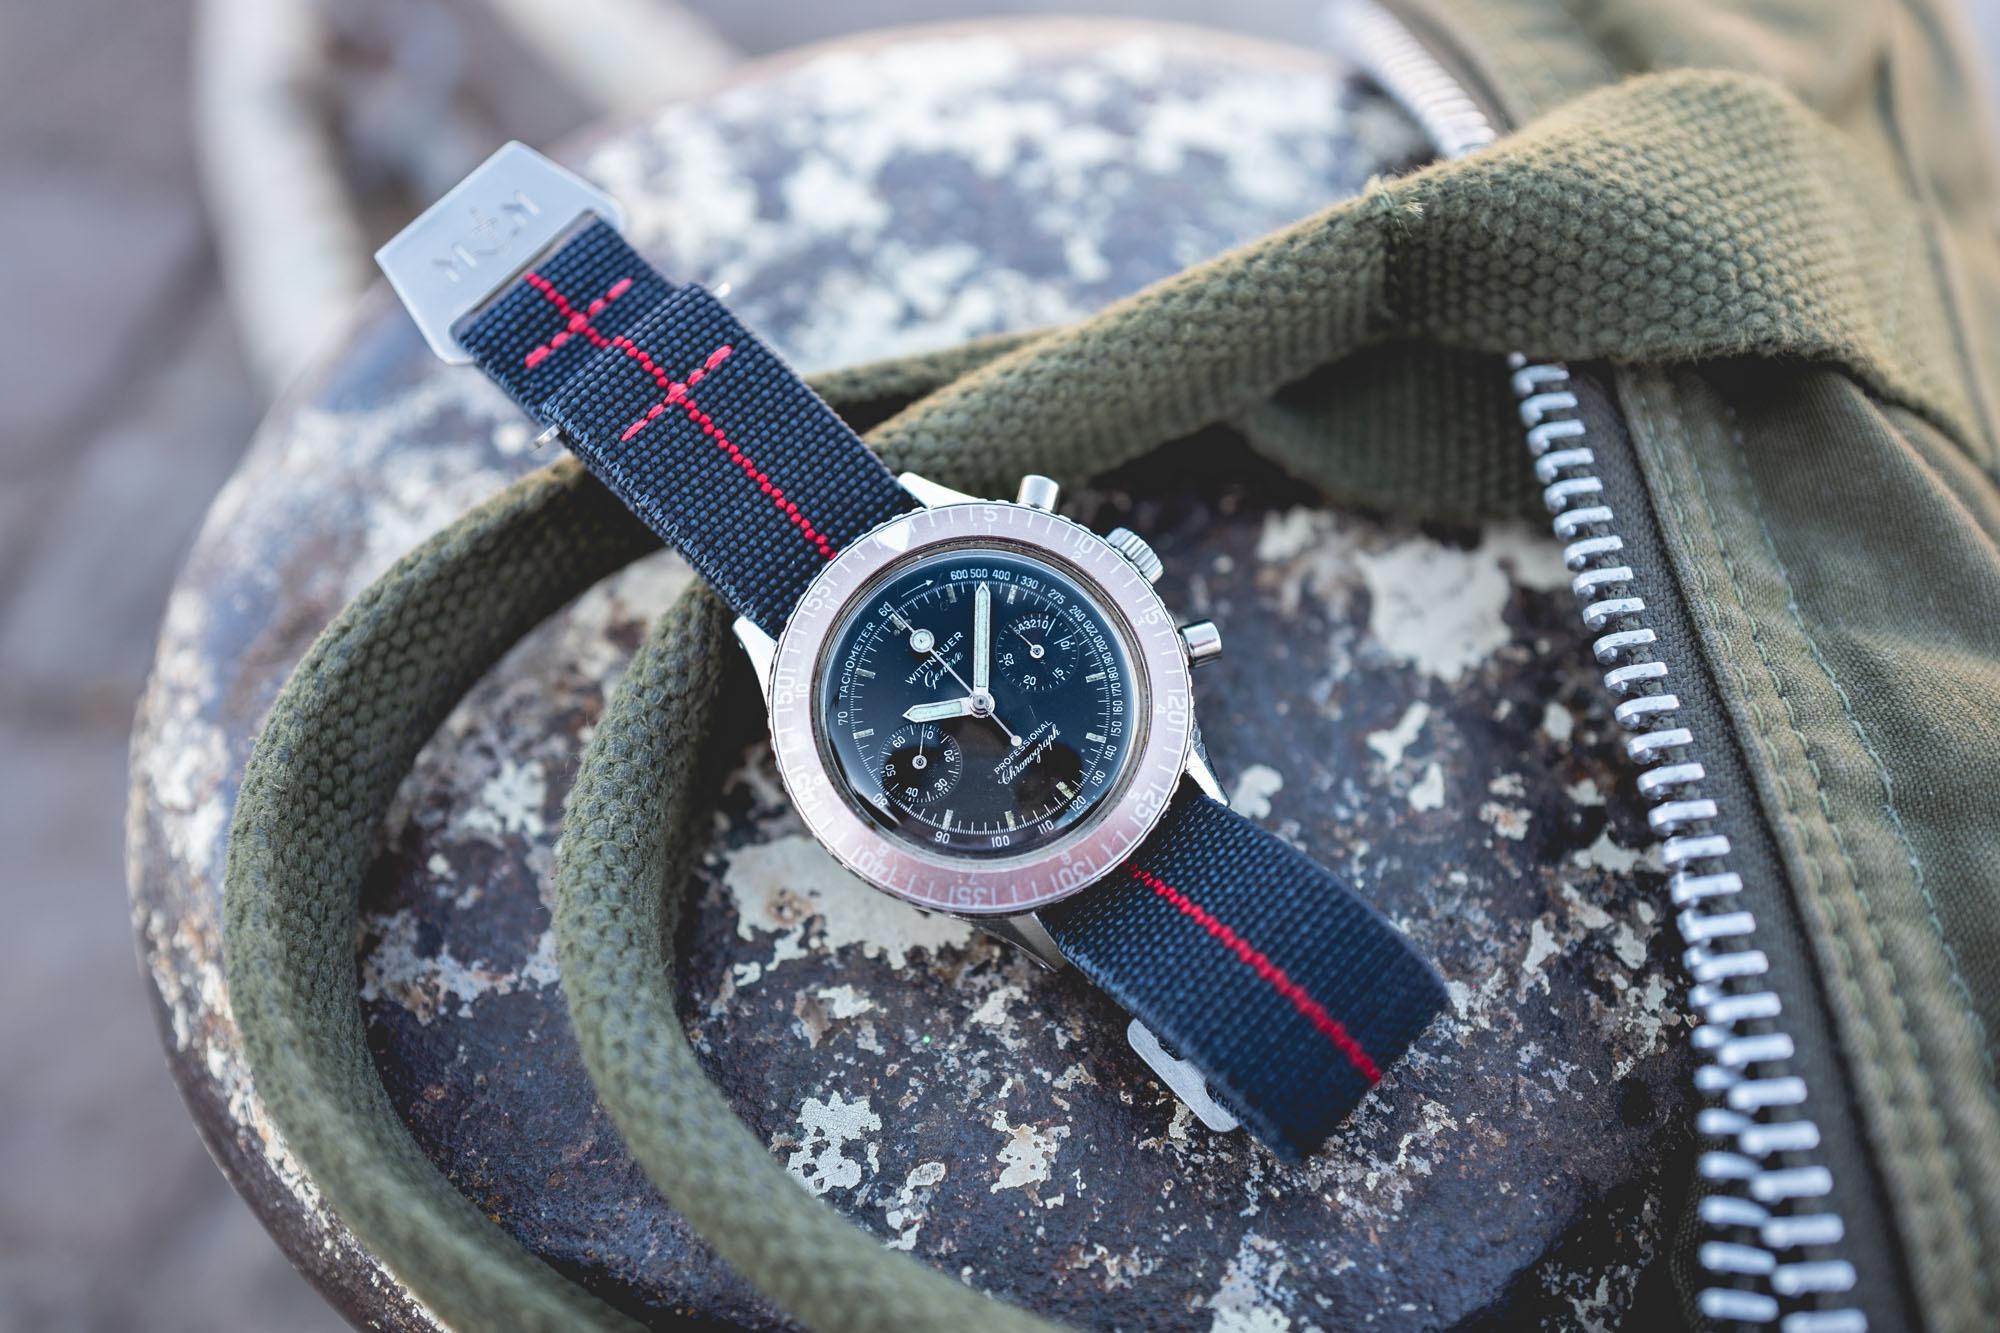 MN Straps - Bracelets Marine Nationale - Wittnauer Chronograph